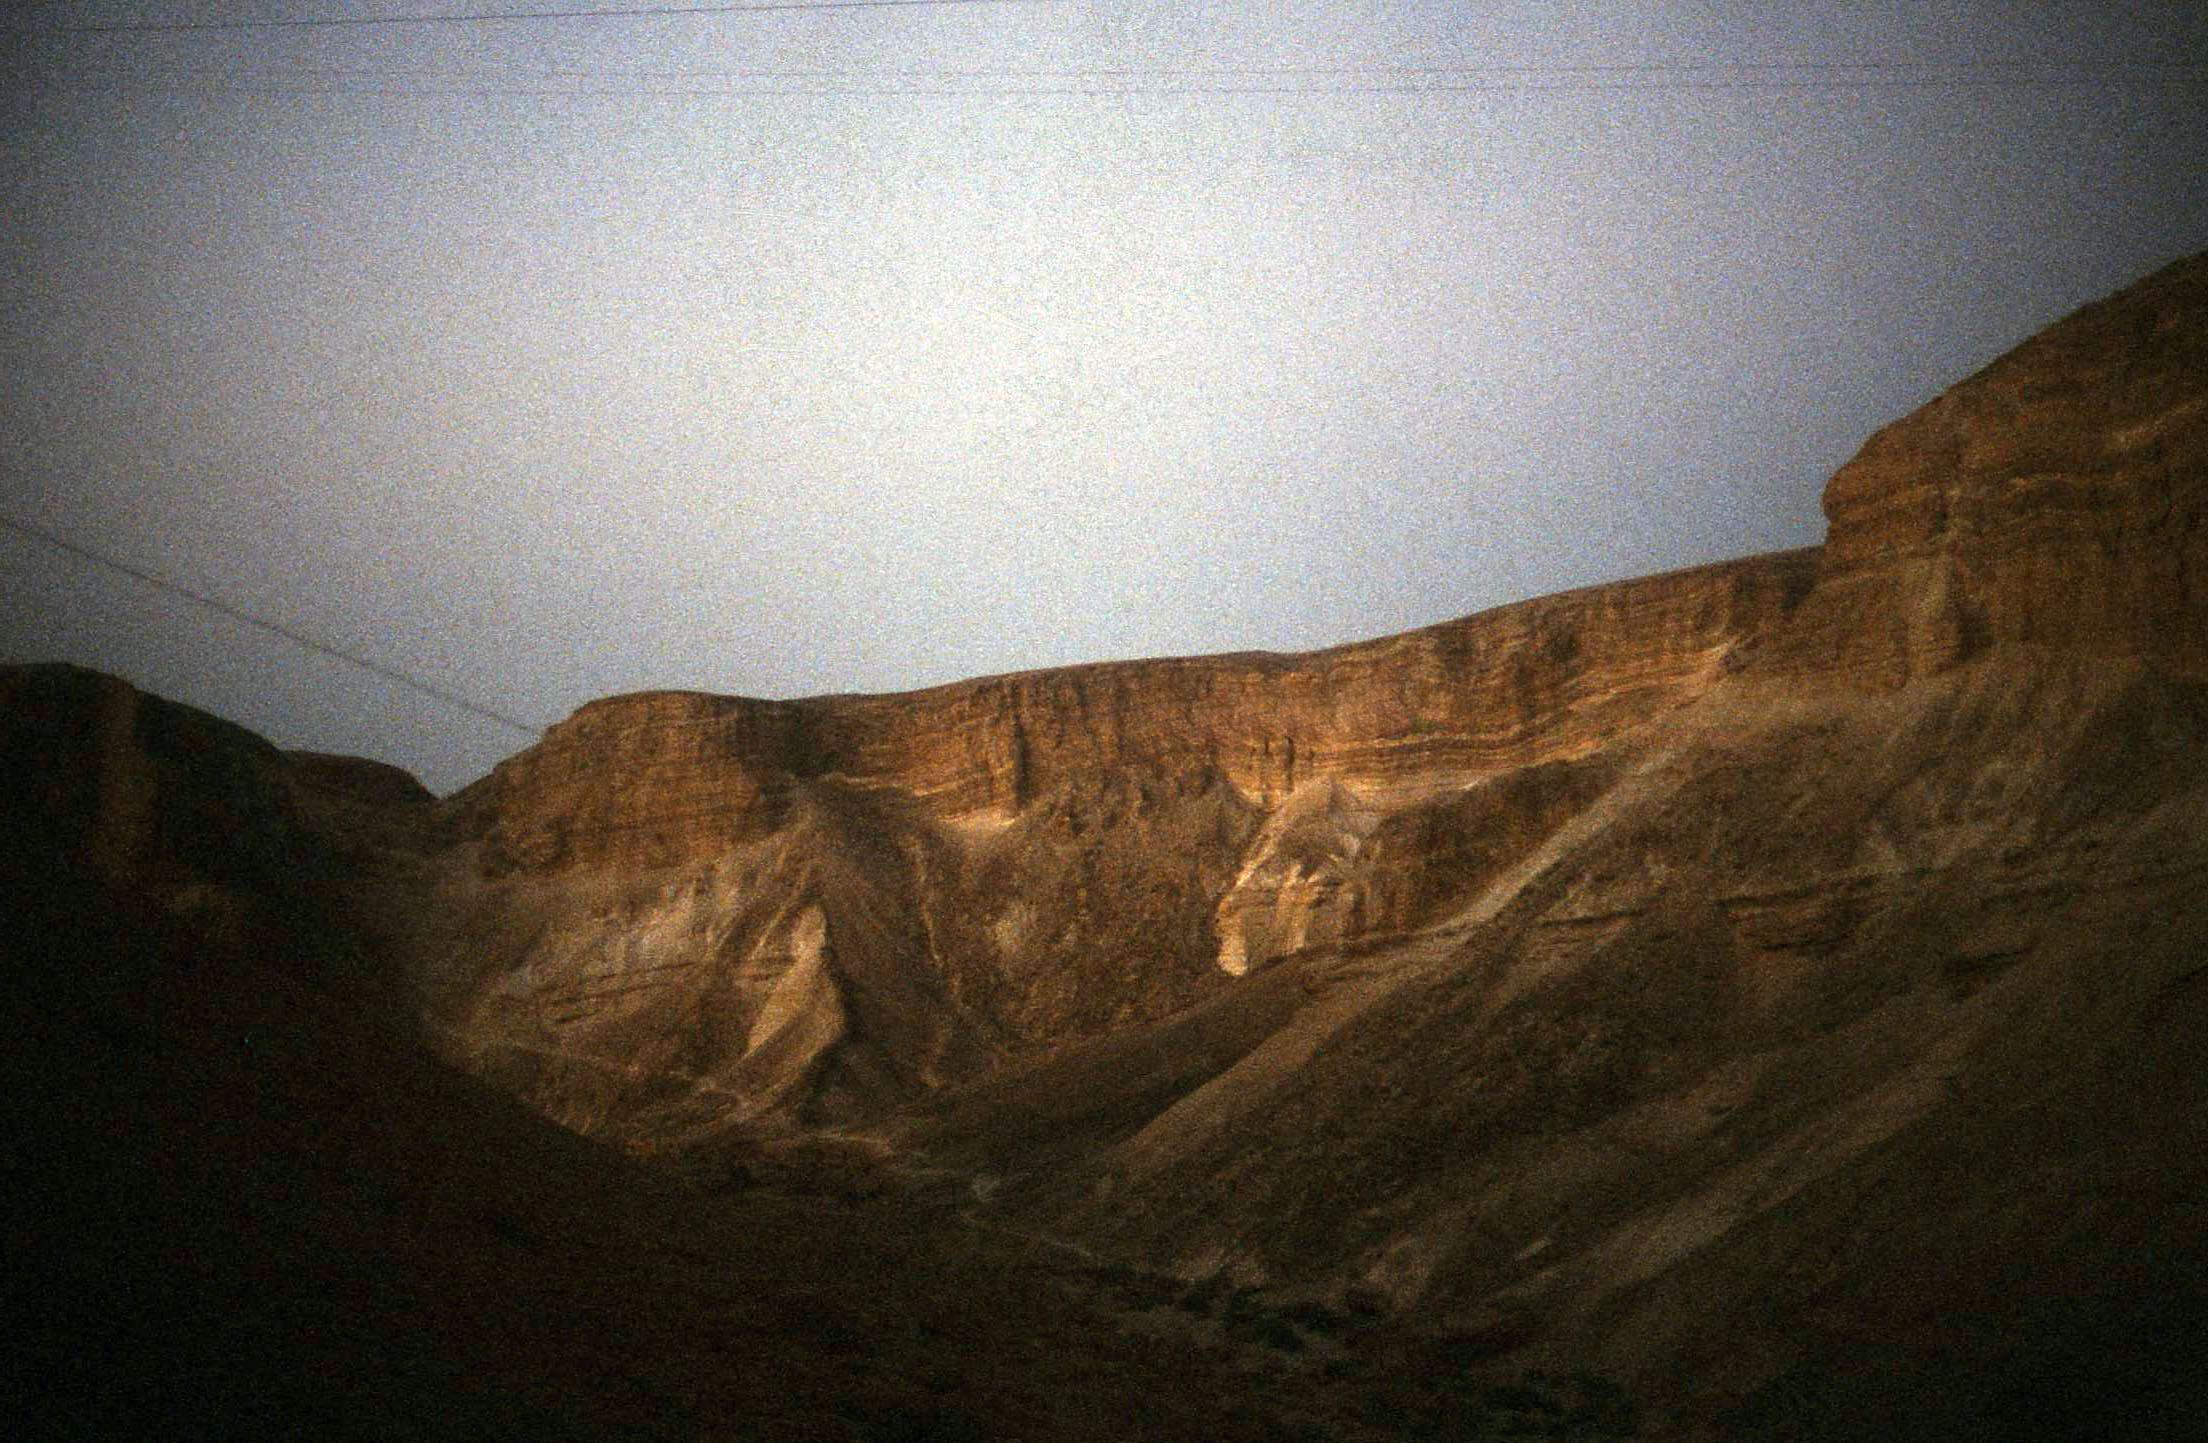 israel-palestina { 35, cromo } - EM BREVE